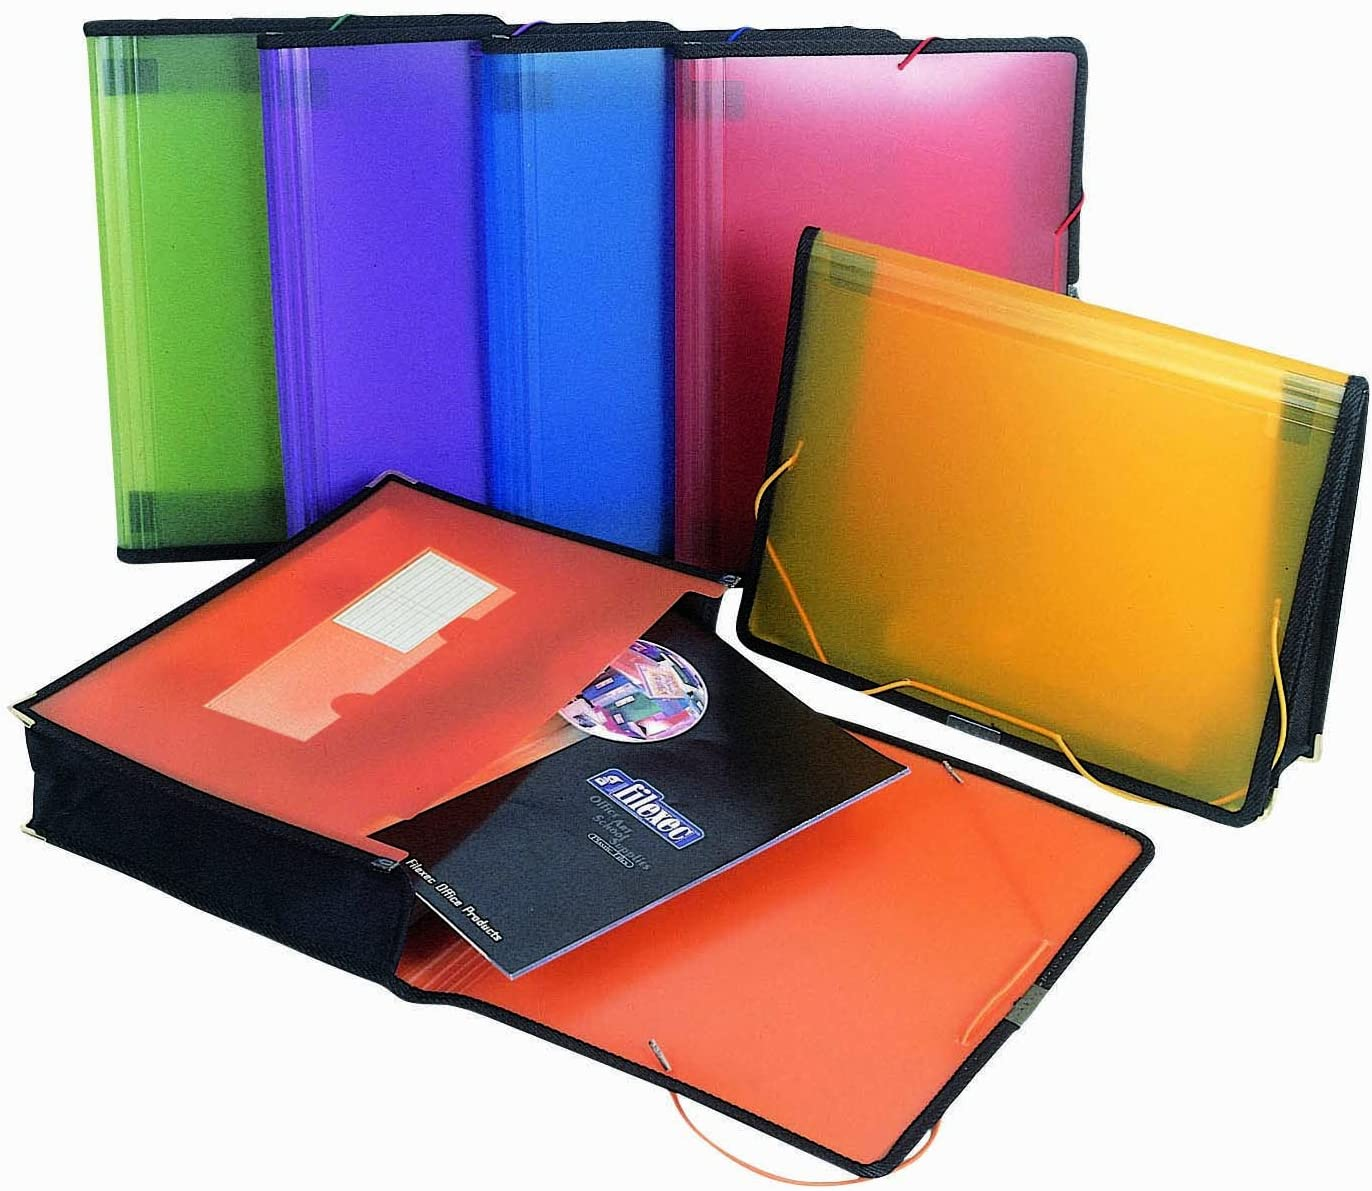 Filexec Single Pocket Expanding File, Letter, Elastic Closure, Assorted, Pack of 6 (50125-3429)